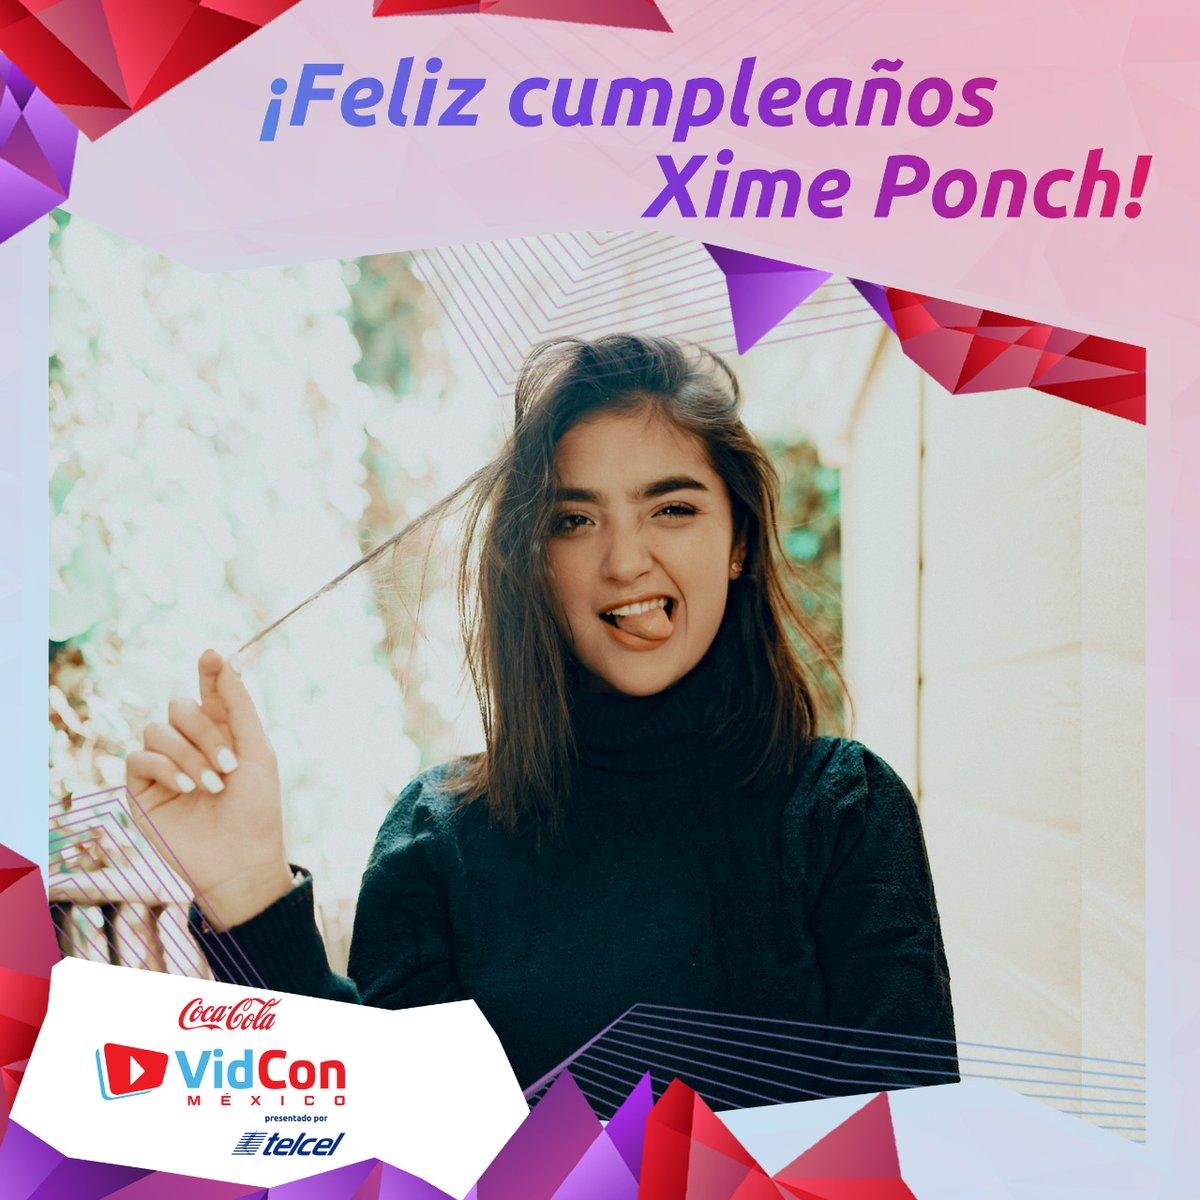 ¡Muchas felicidades @ximeponchof ! 🥳¿Ya le mandaron mucho cariño a la cumpleañera?¡Nos vemos pronto! #vidconmxready